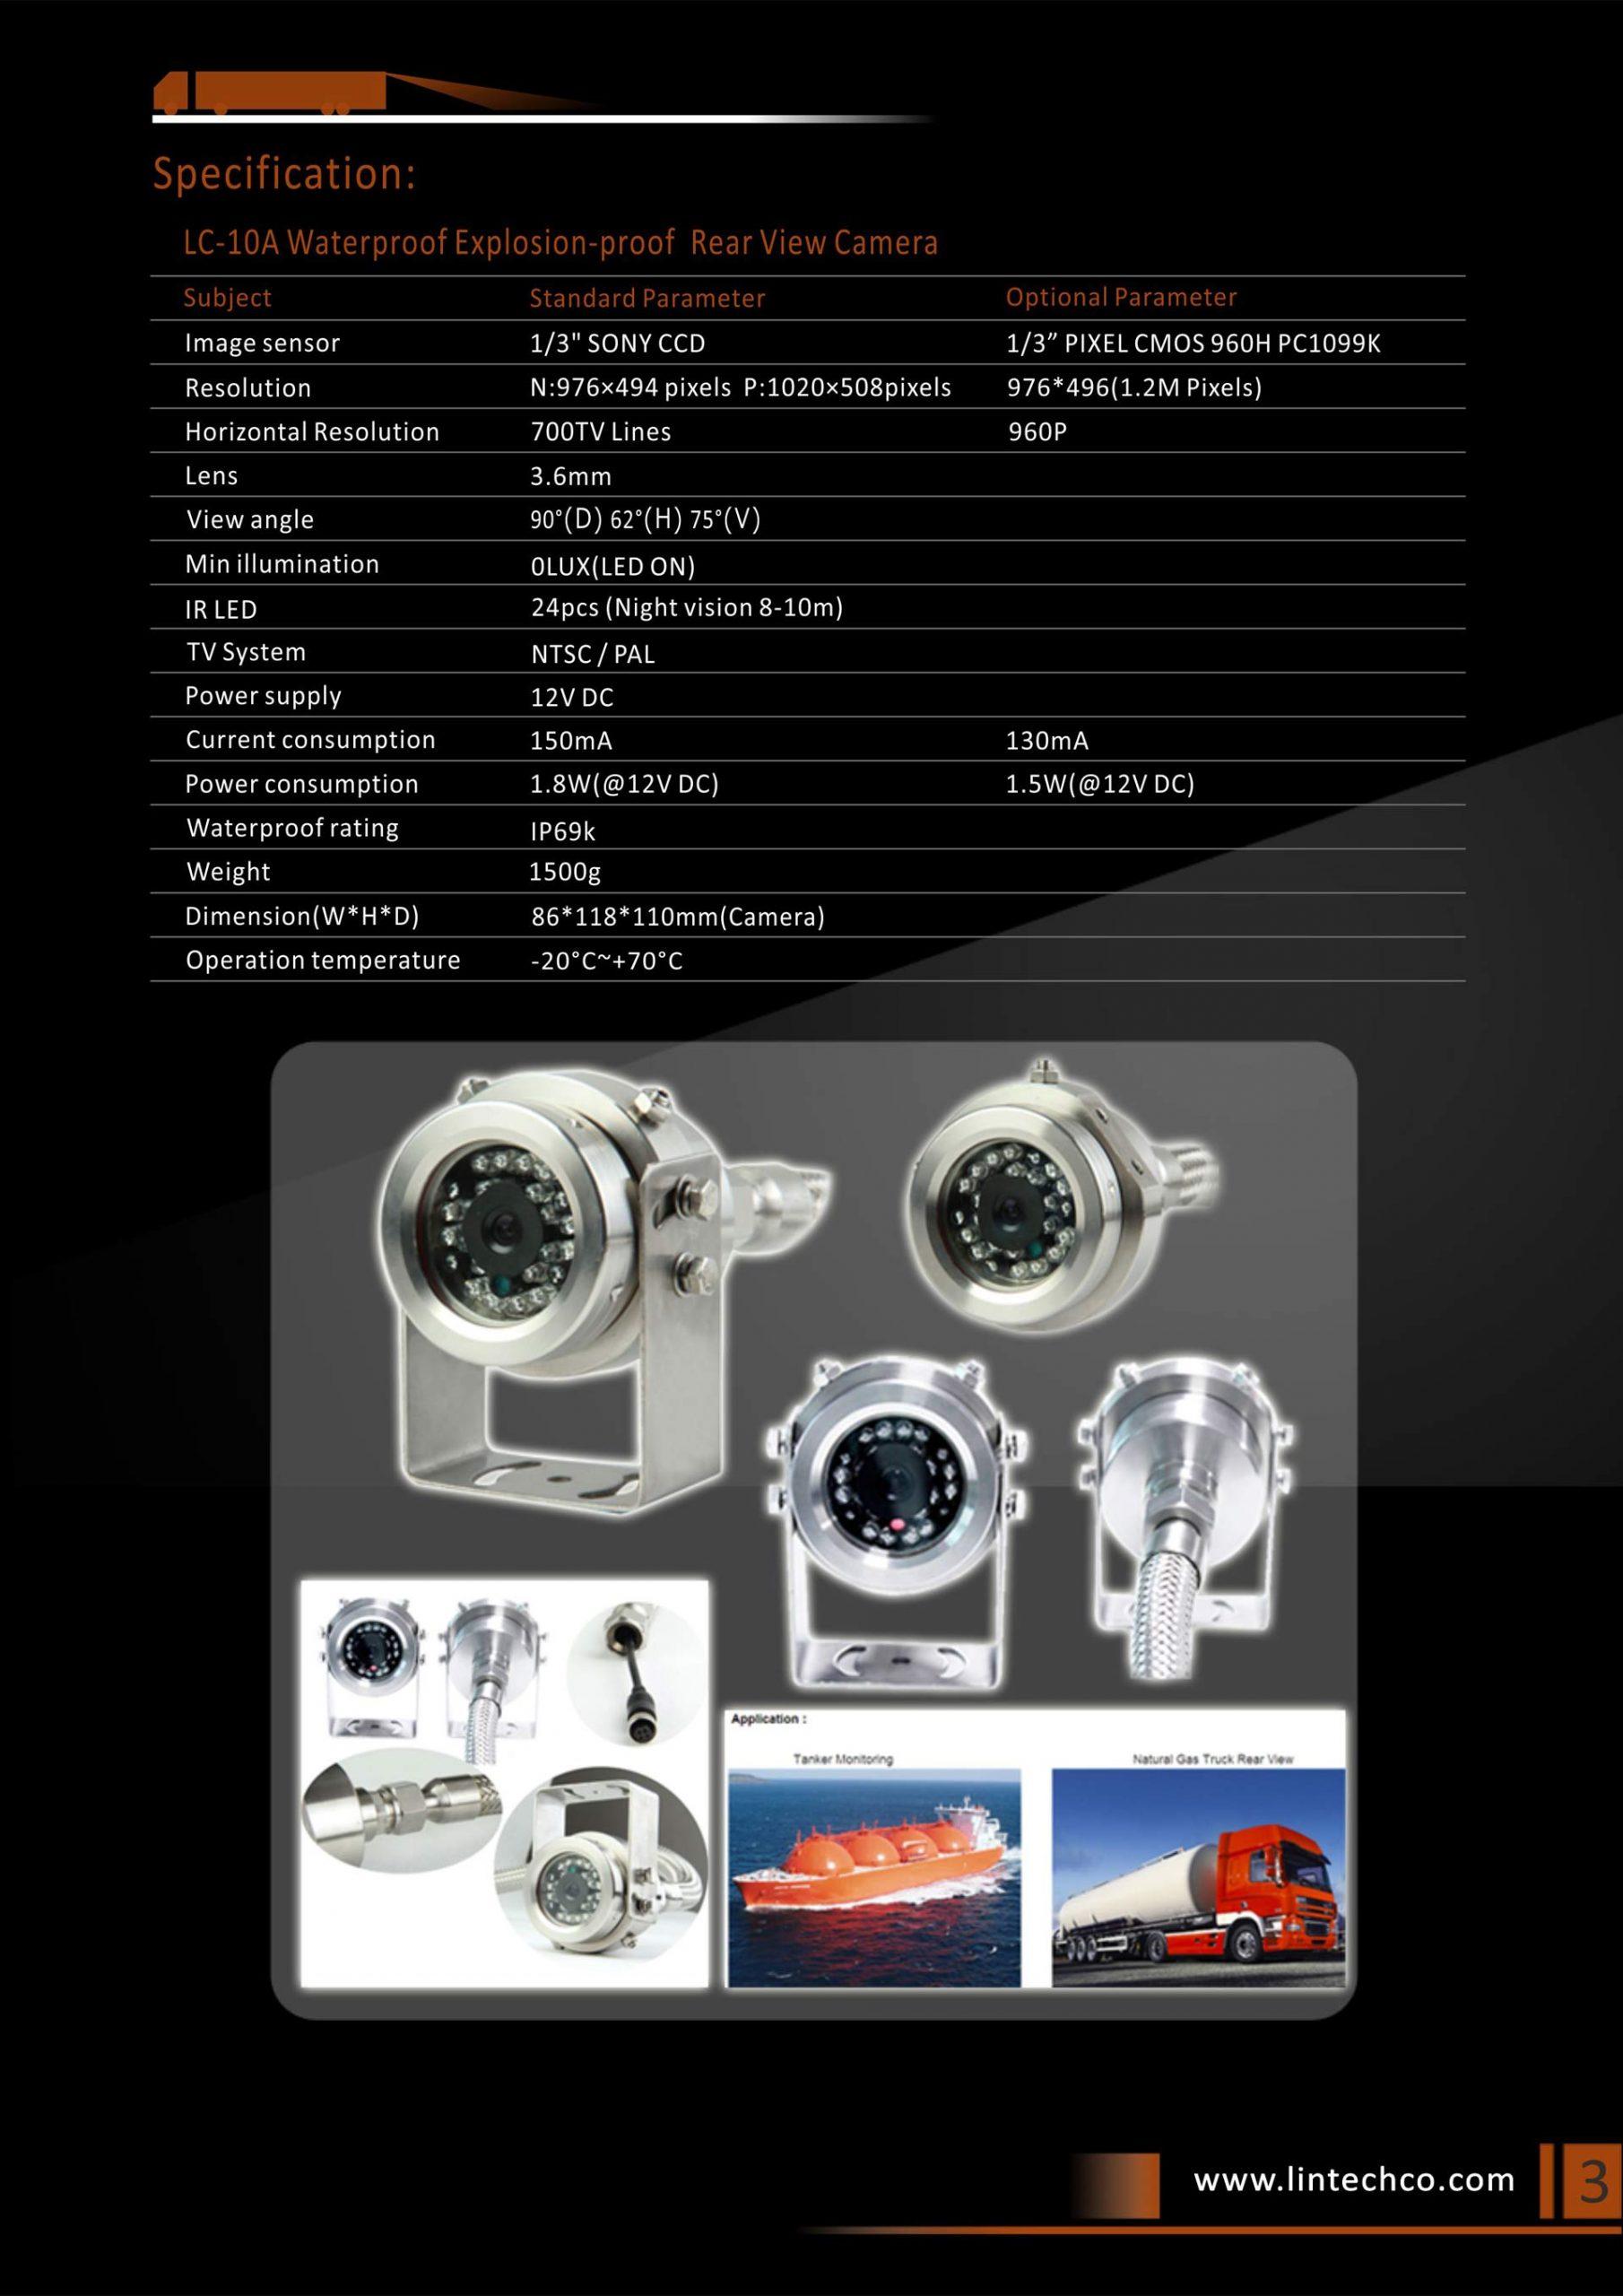 3.304 Stainless Steel Waterproof Explosion-proof Rear View Camera